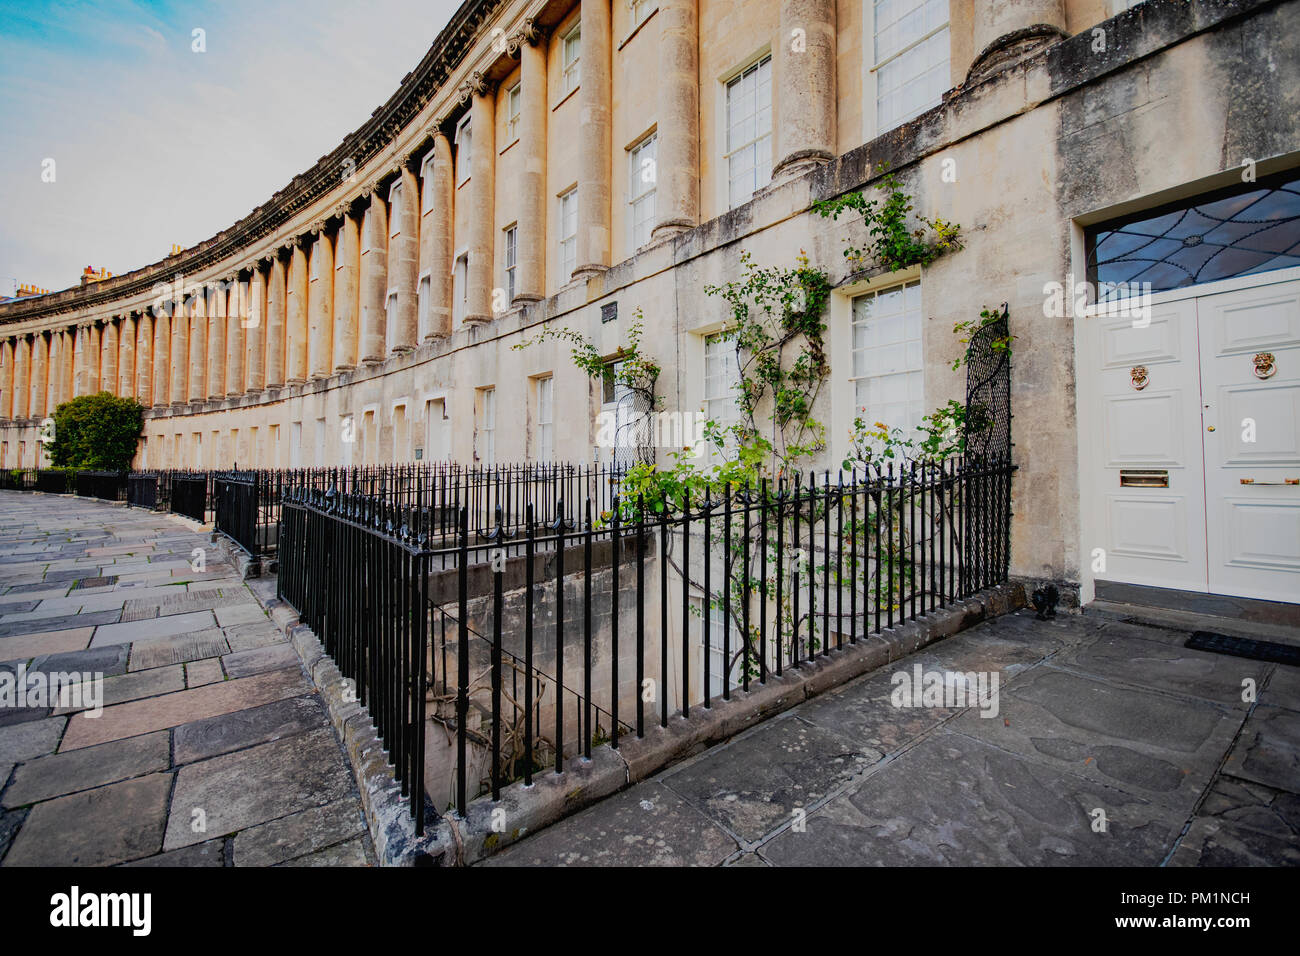 Die berühmte Royal cresecent Architektur Stockbild